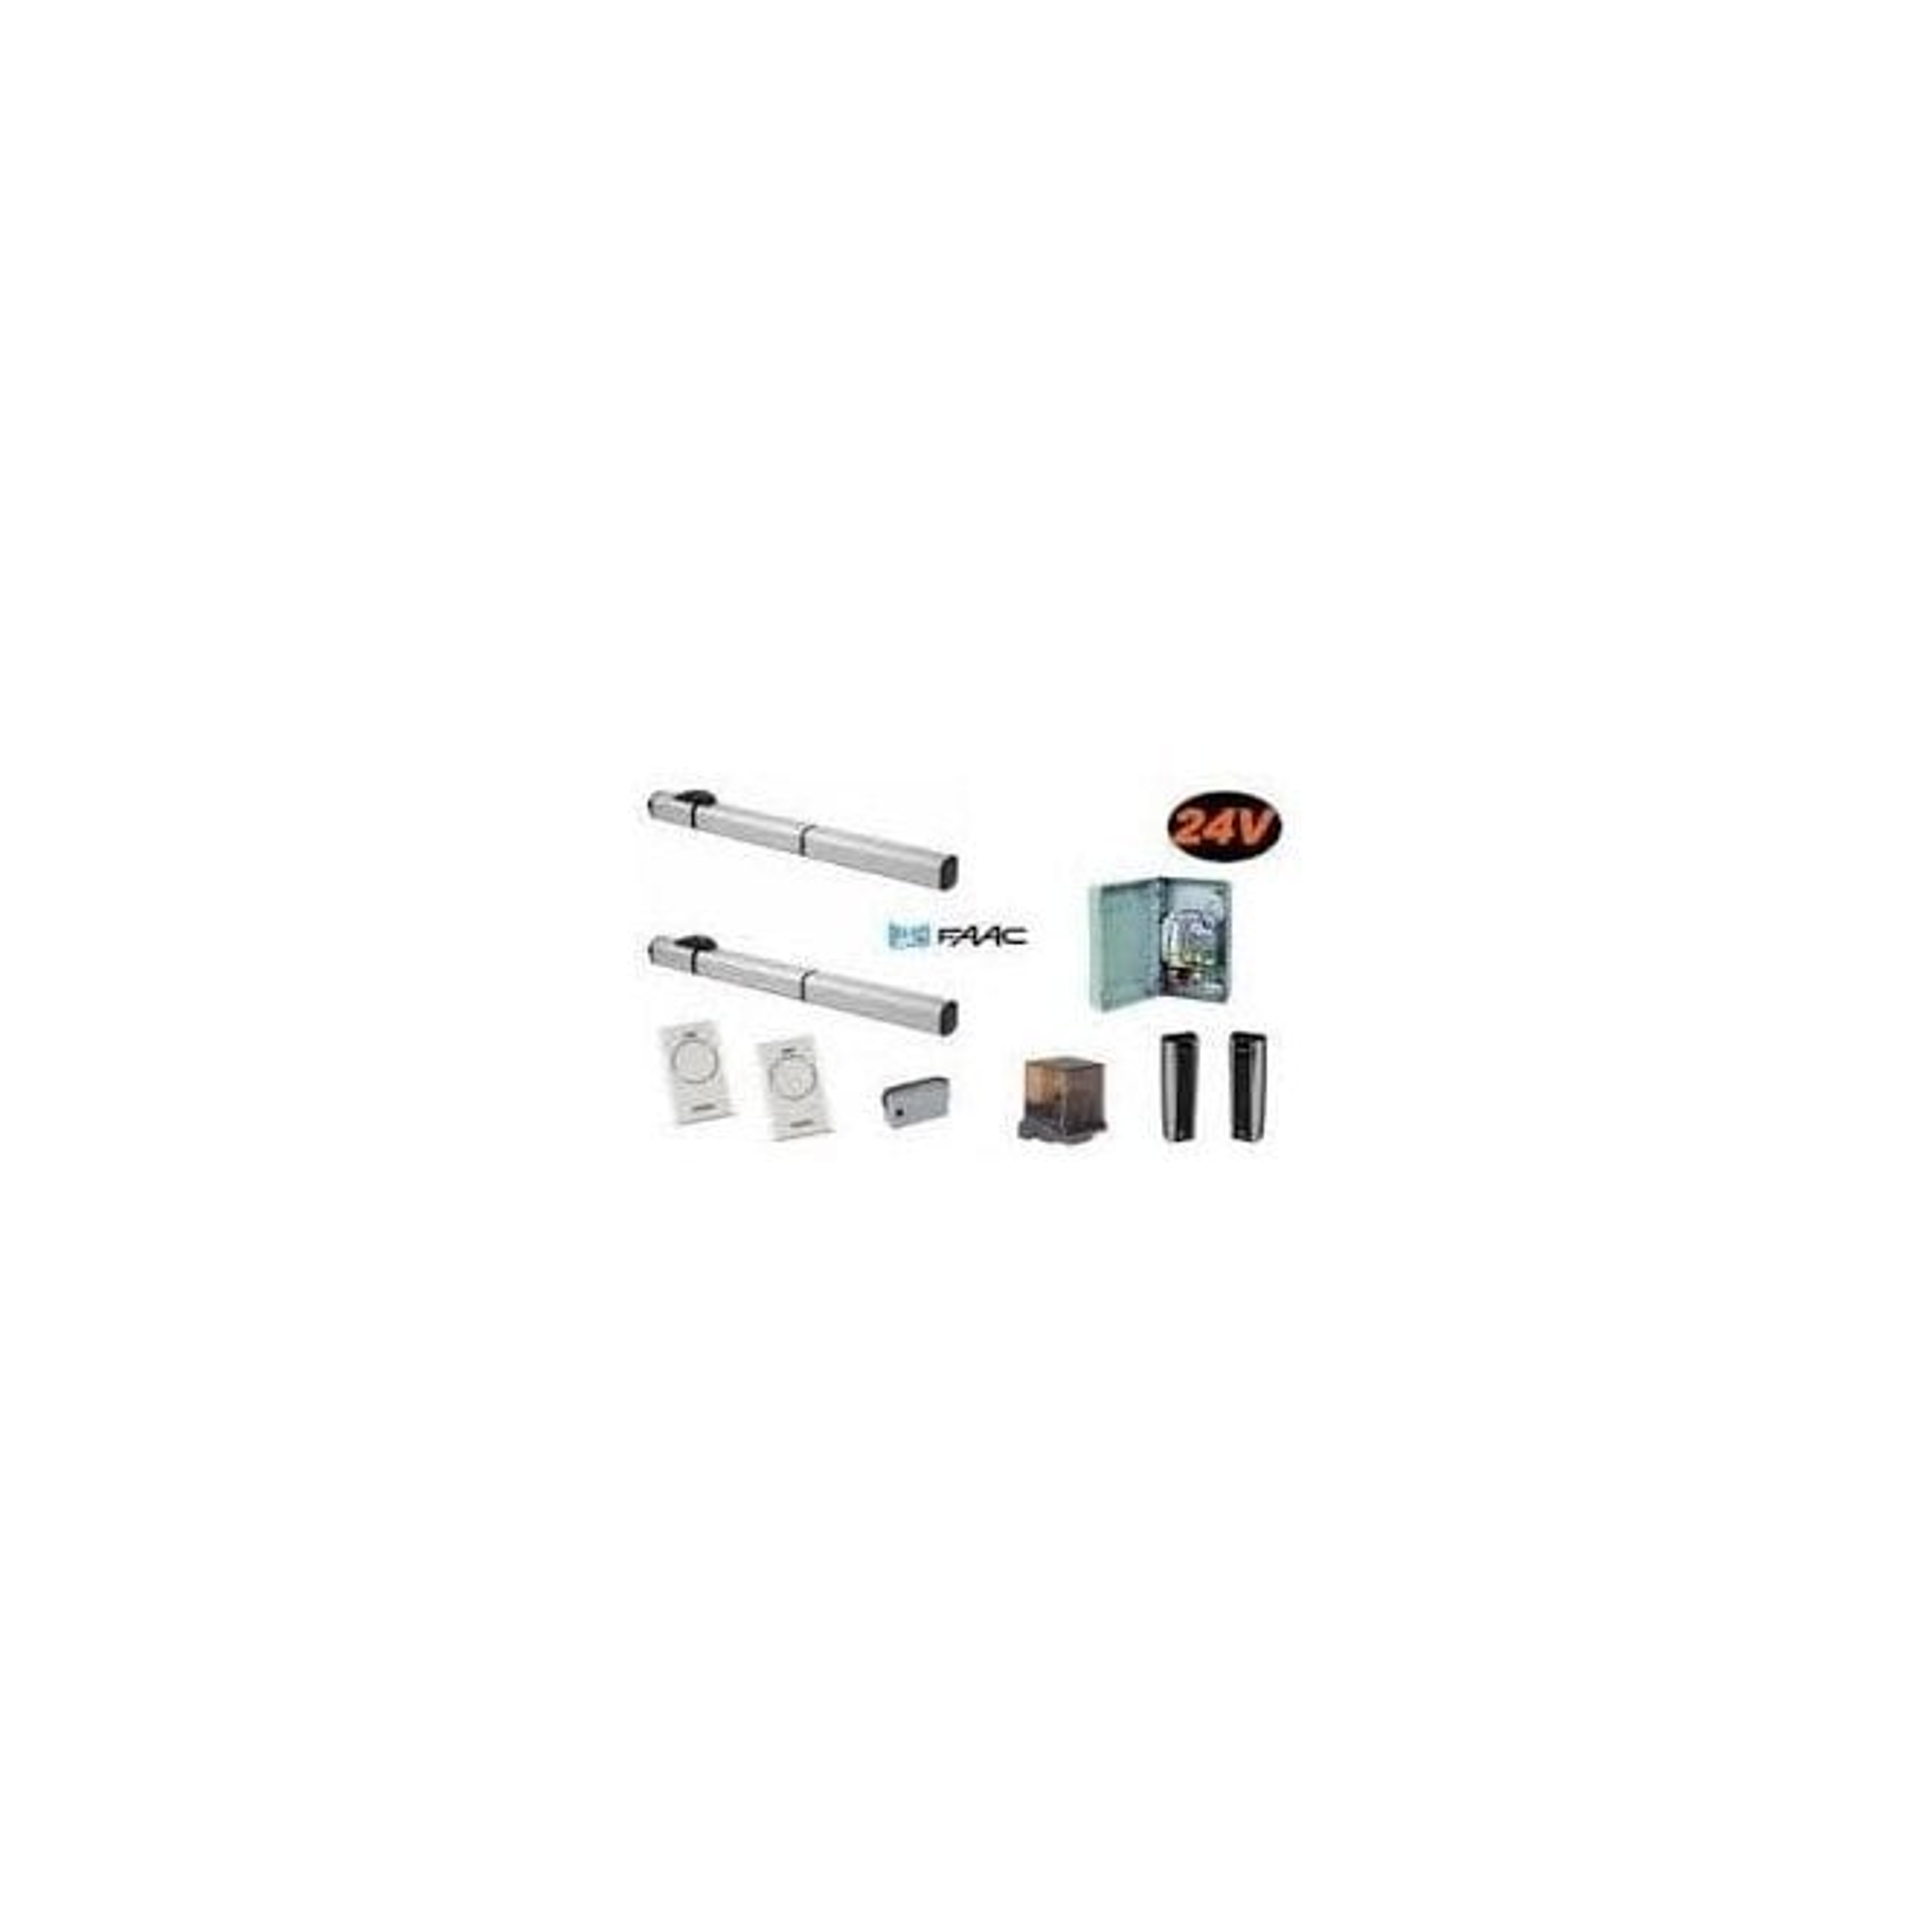 FAAC S450 E124 KIT 24v hydraulic operator E124 double kit for swing gates